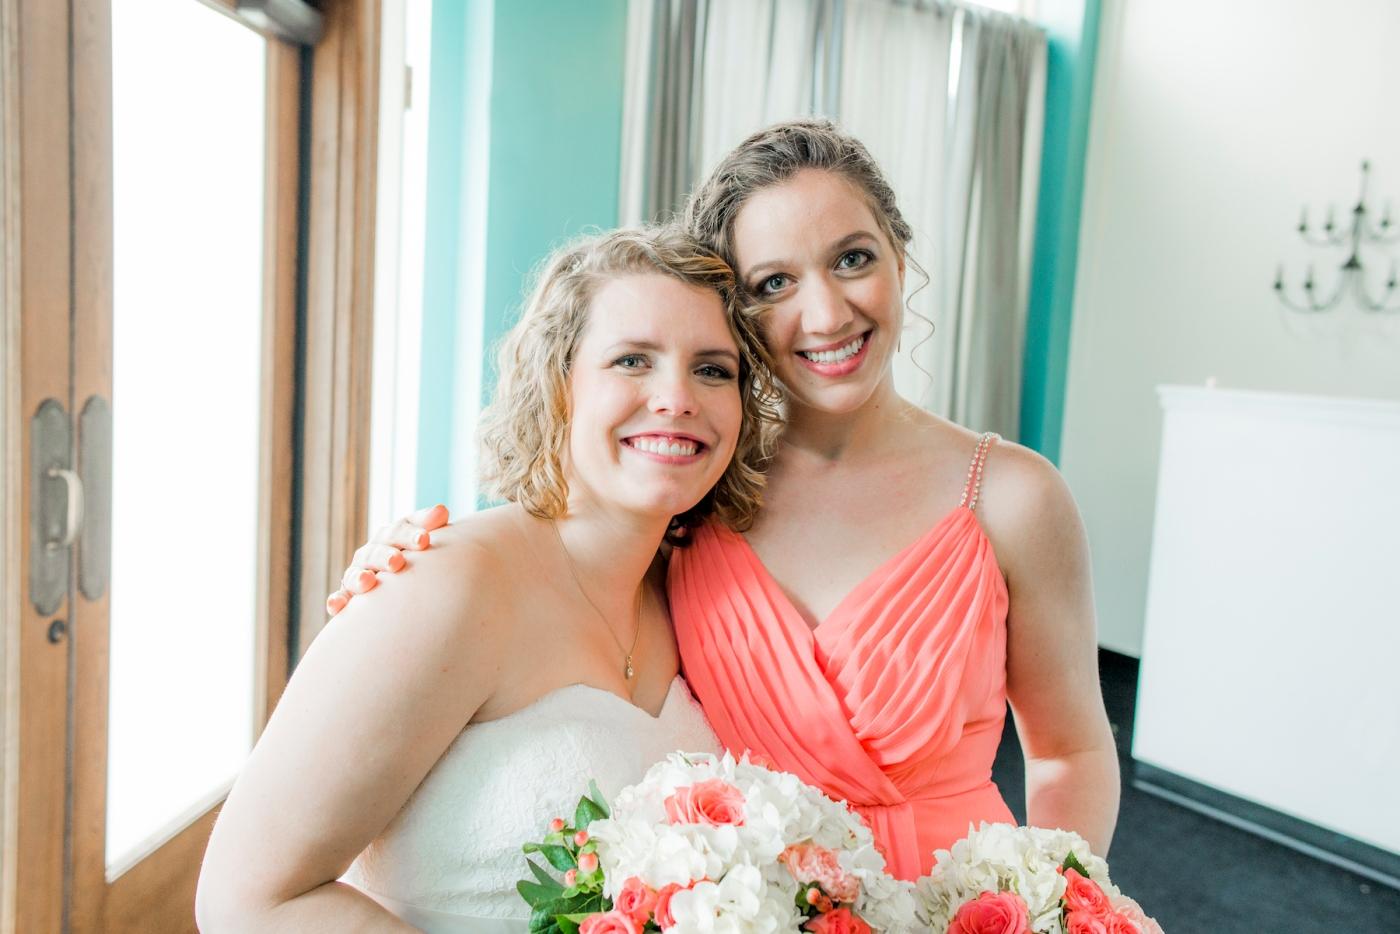 DSC_2867Everett_Wedding_Ballroom_Jane_Speleers_photography_Rachel_and_Edmund_bridesmaids_2017